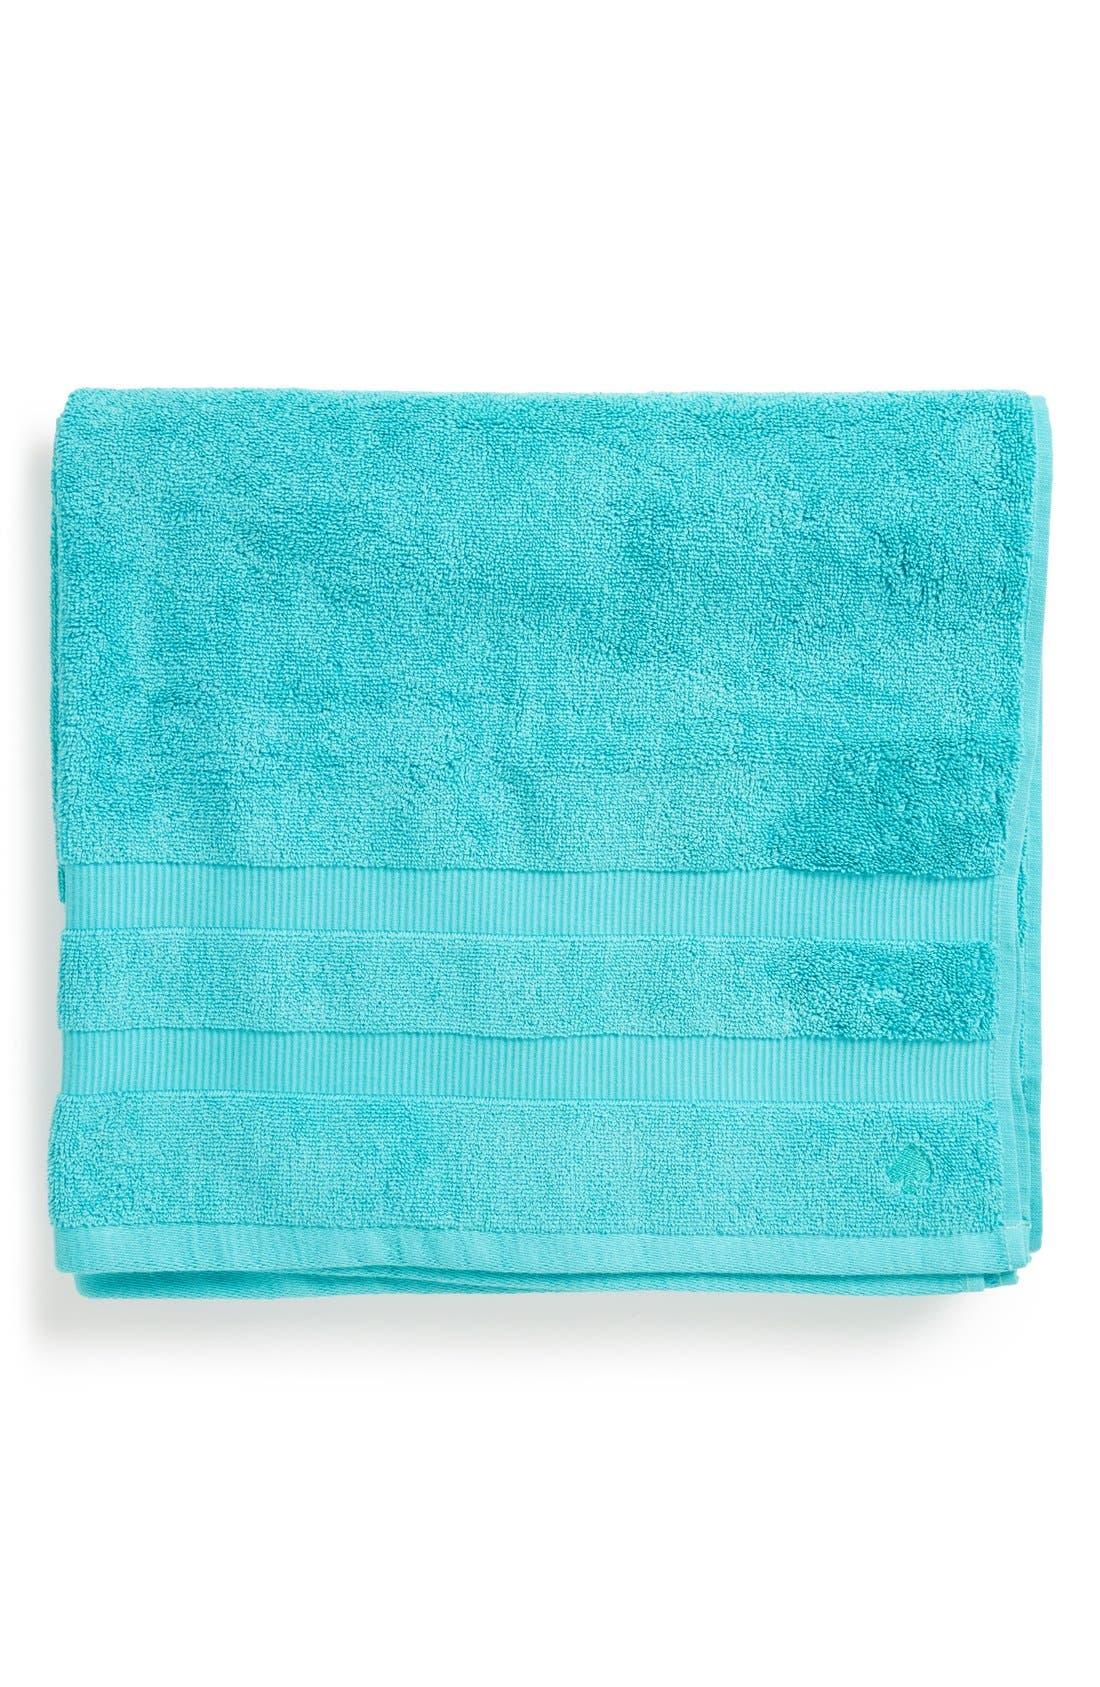 'chattam stripe' bath towel,                             Main thumbnail 1, color,                             POOLSIDE